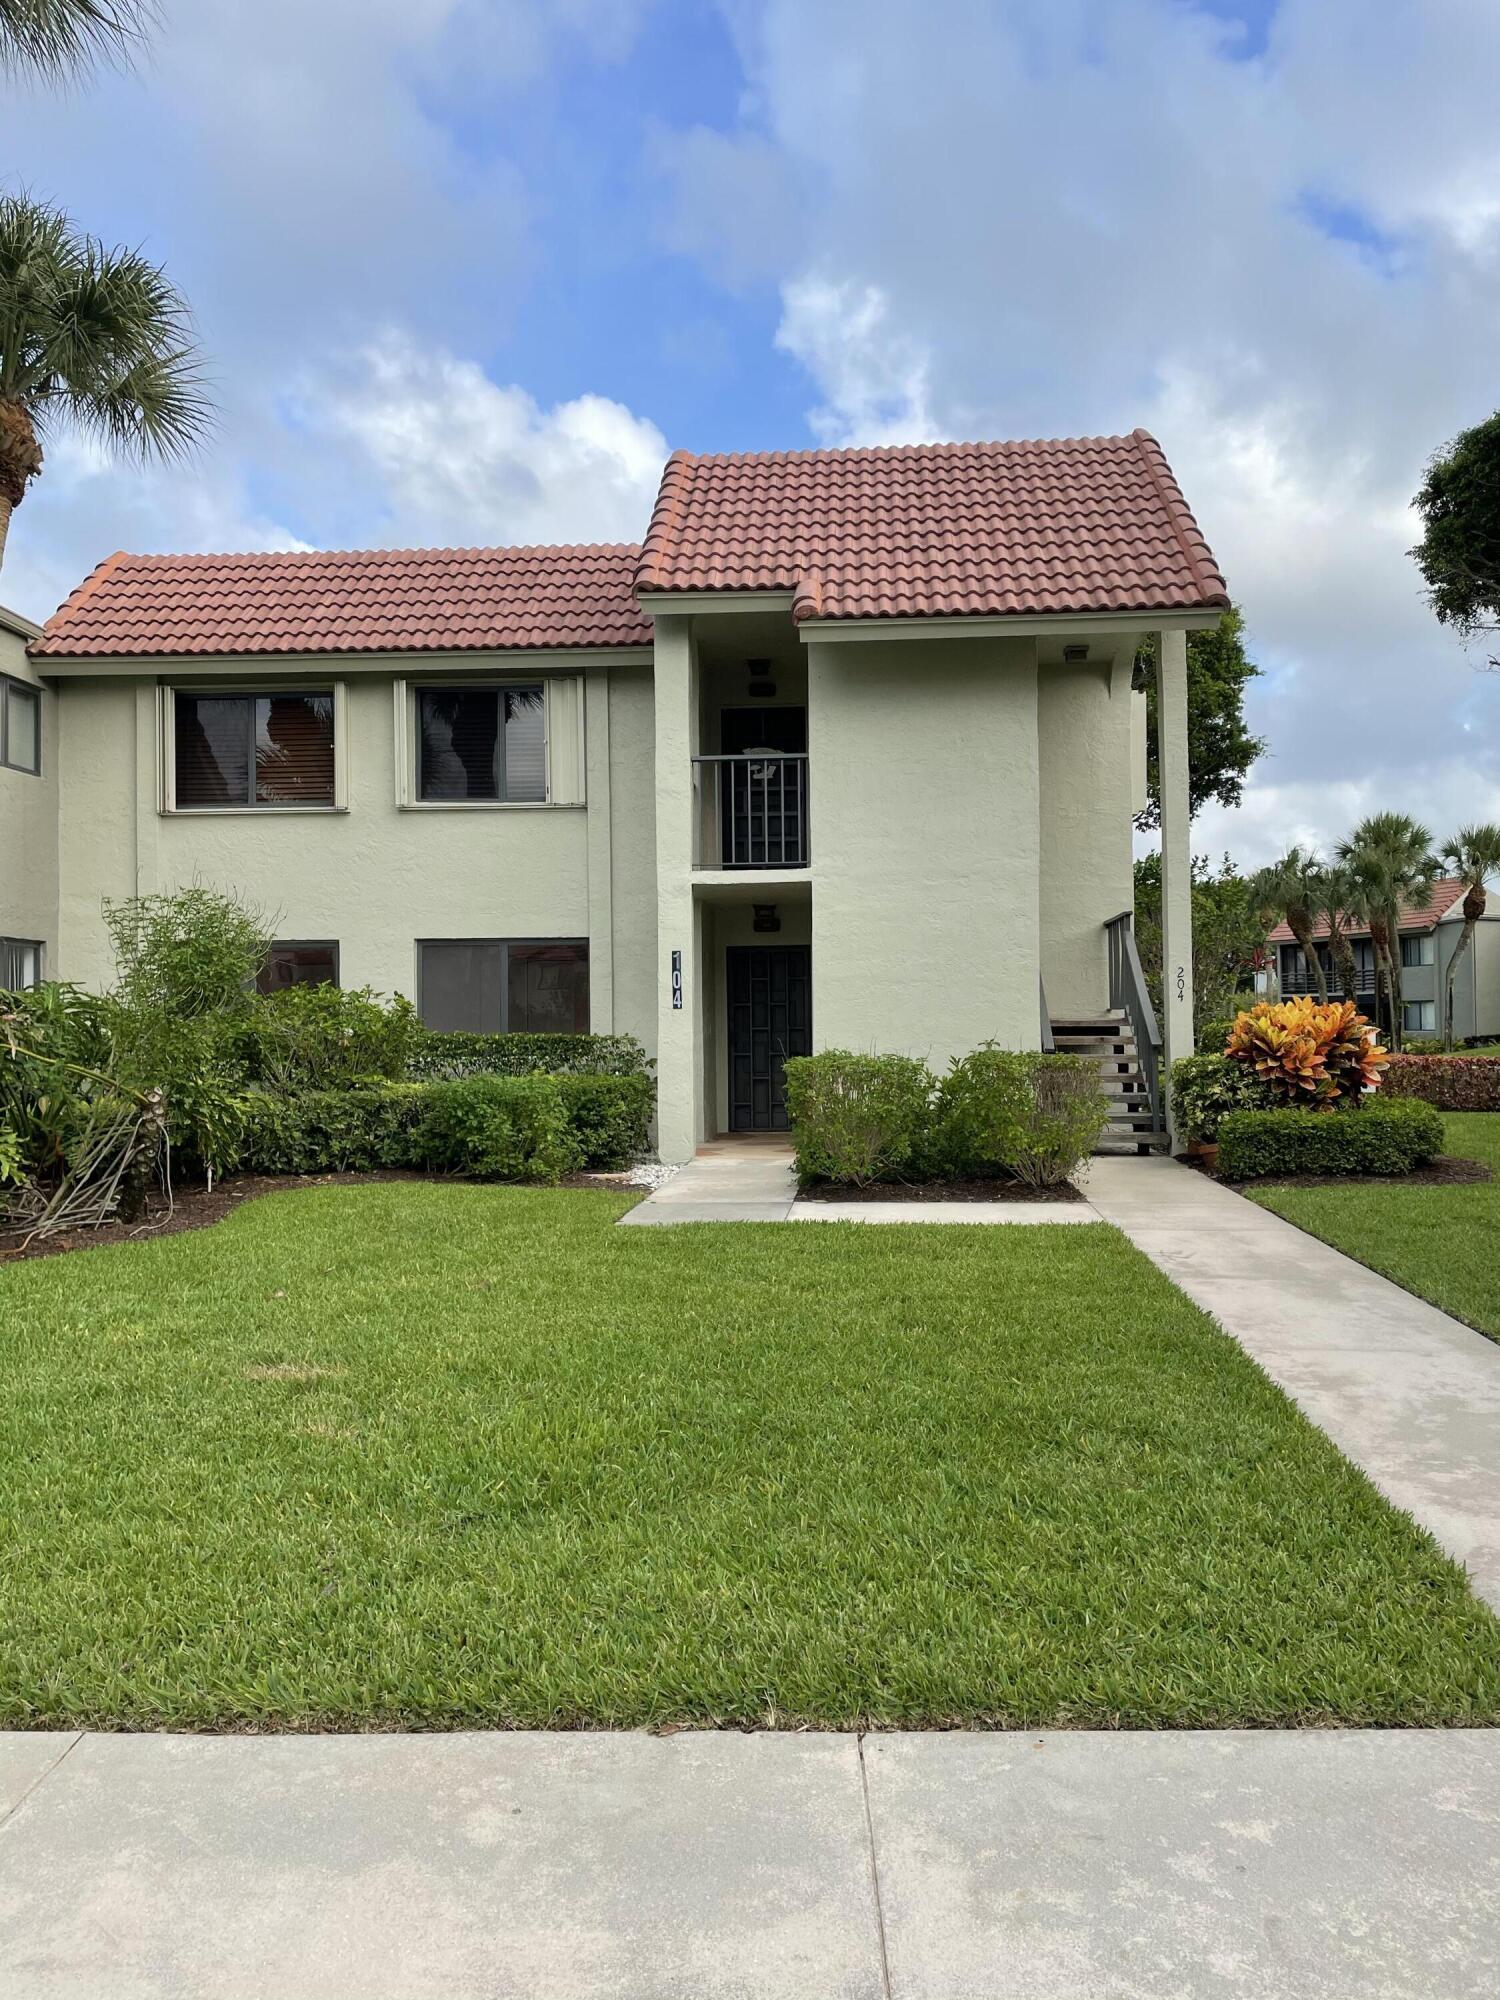 5674 Fairway Park Unit 204, Boynton Beach, Florida 33437